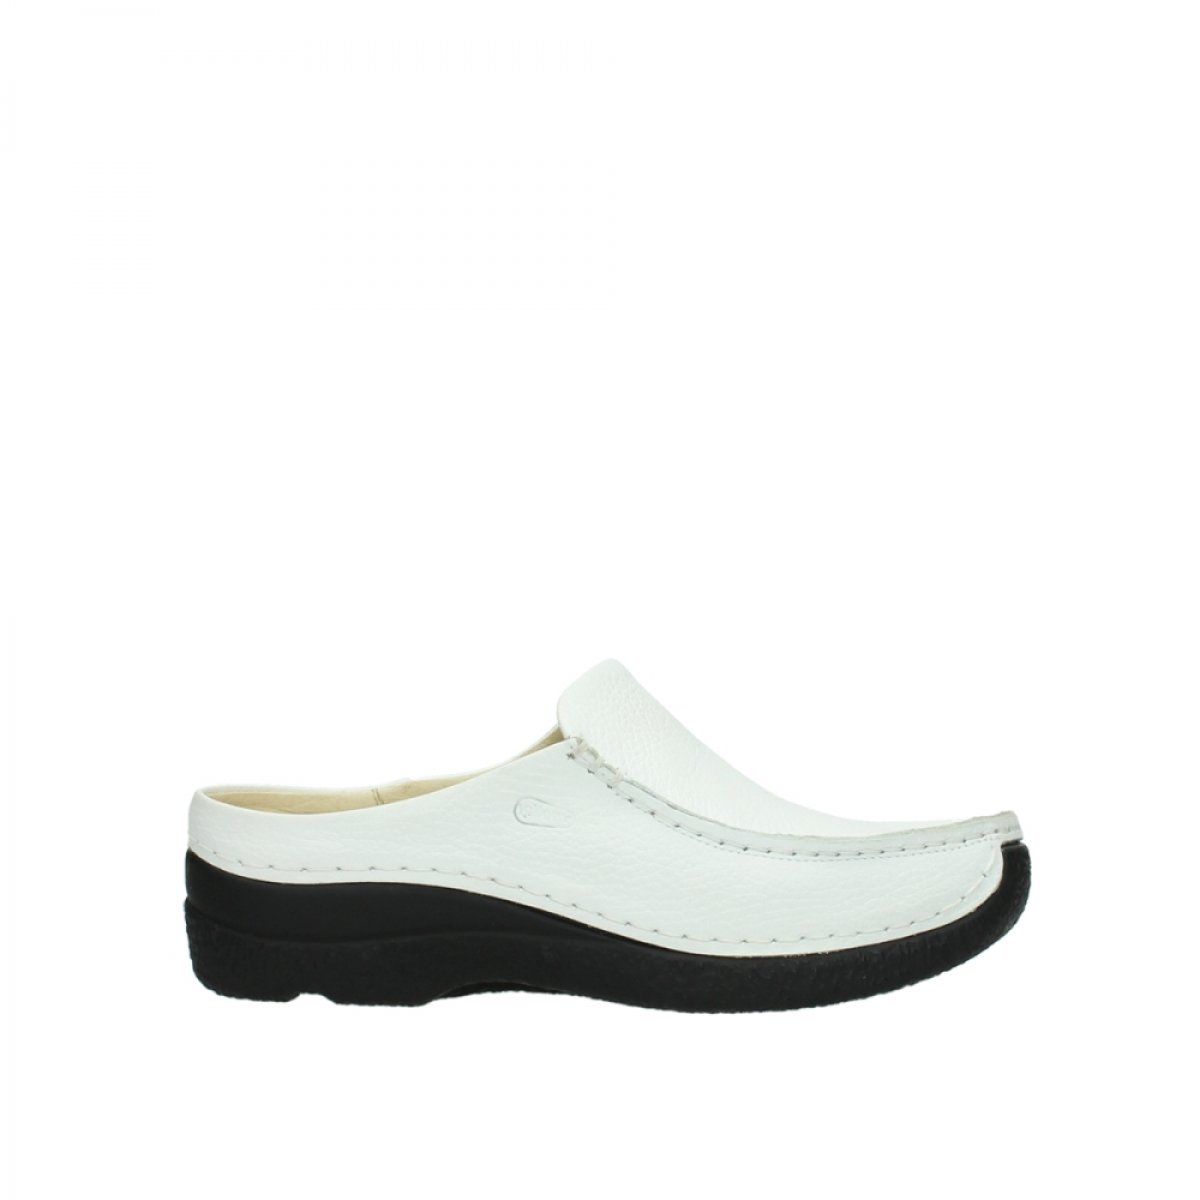 wolky Roll Slipper 6250 seamy Slide 40 EU|70100 White Printed Leather